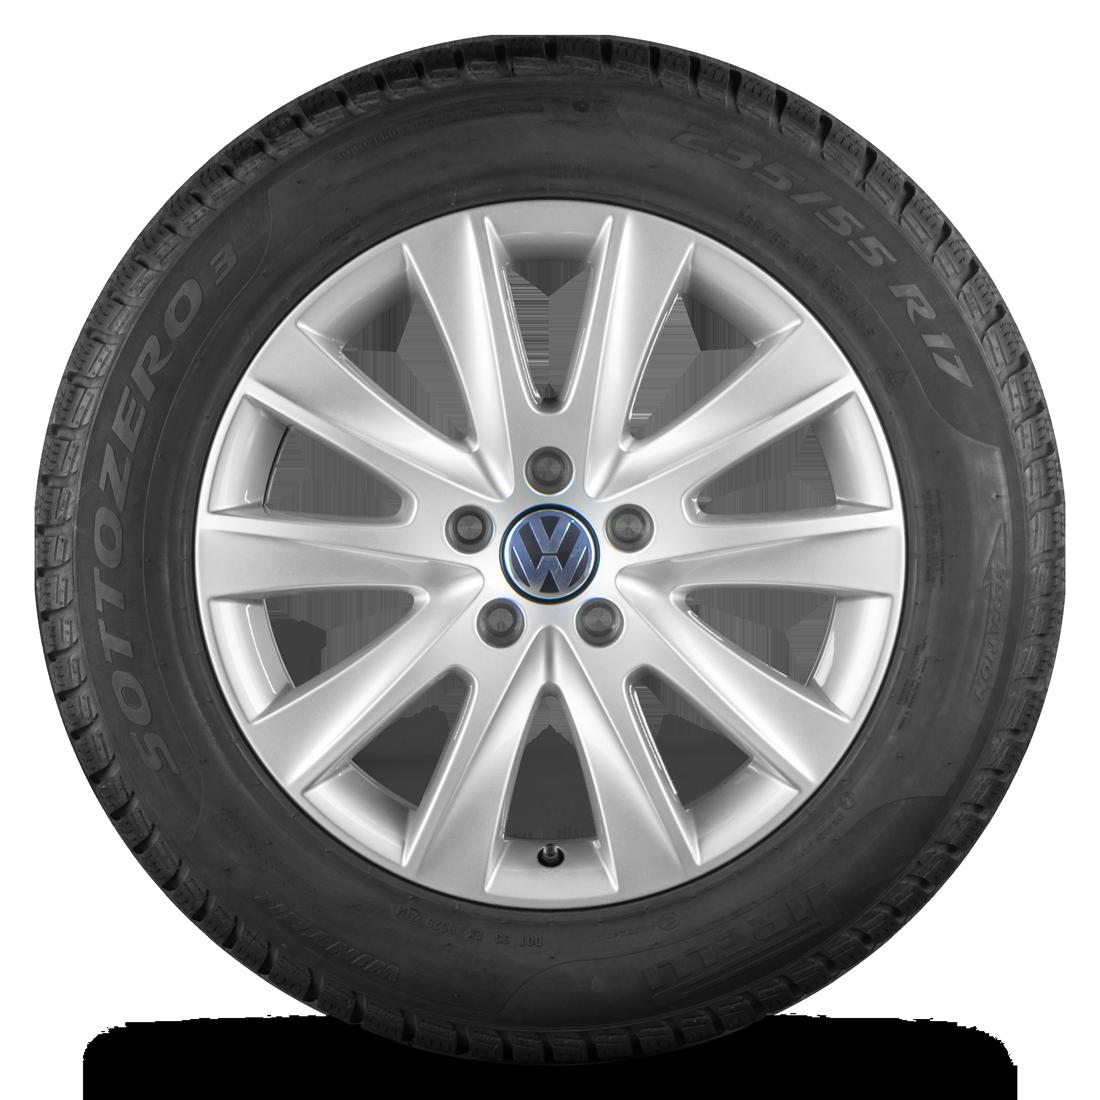 VW 17 Zoll Felgen Tiguan 5N Los Angeles Alufelgen Winterreifen Winterräder